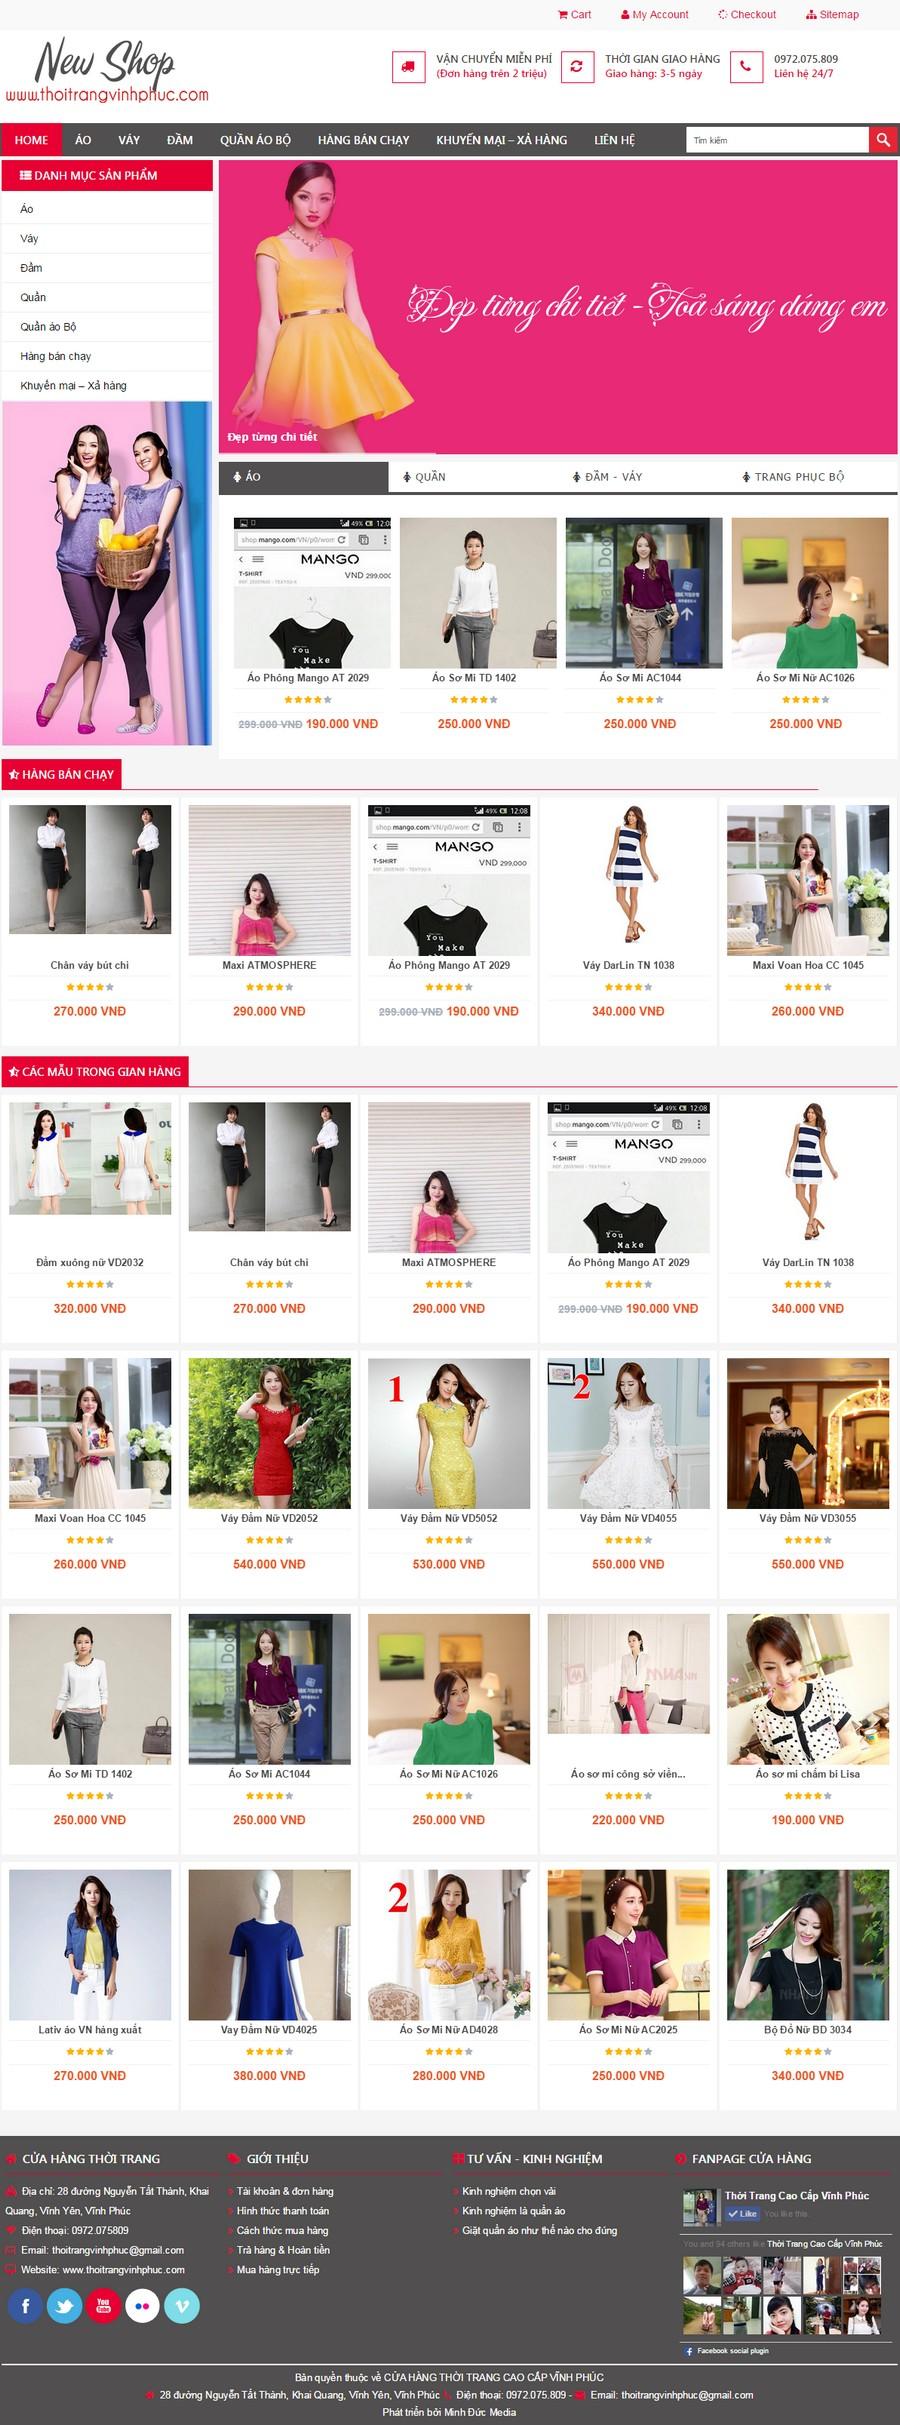 Web Shop thoitrangvinhphuc.com